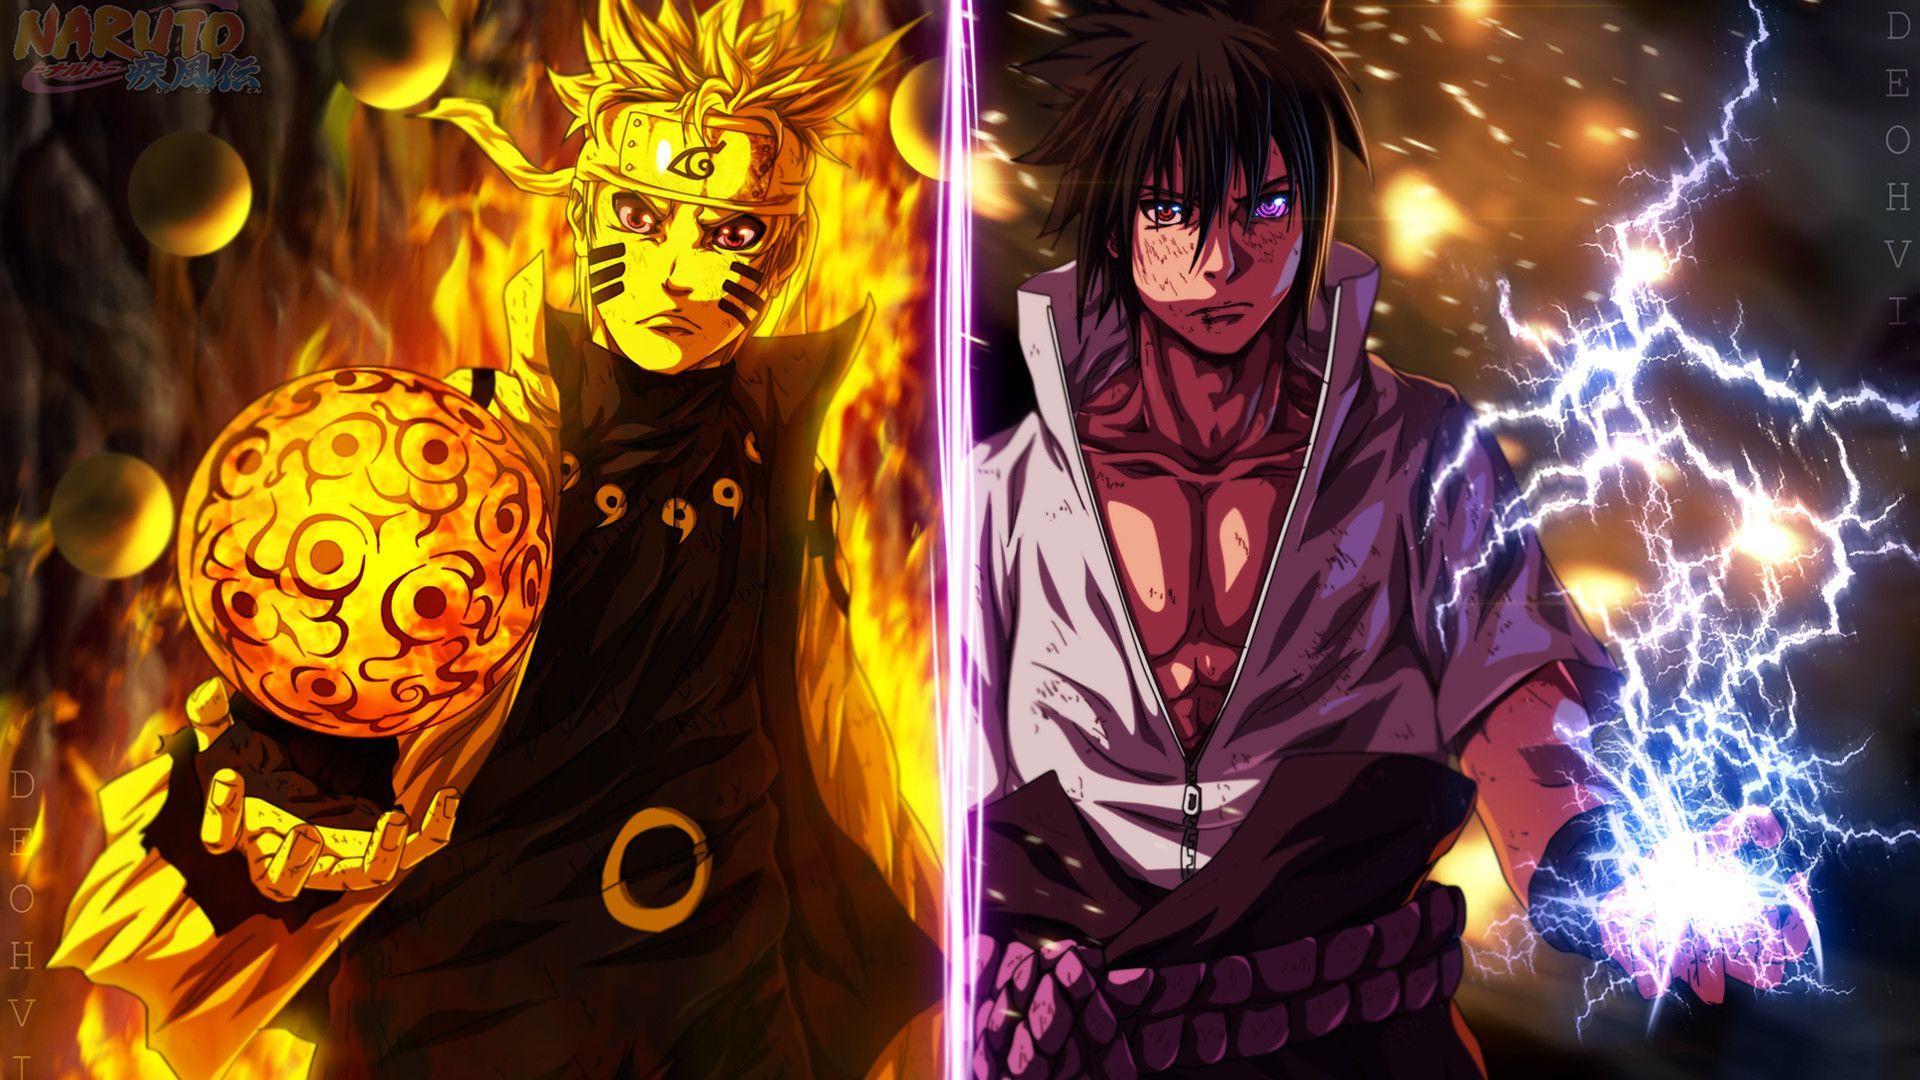 Naruto Hd Wallpapers Top Free Naruto Hd Backgrounds